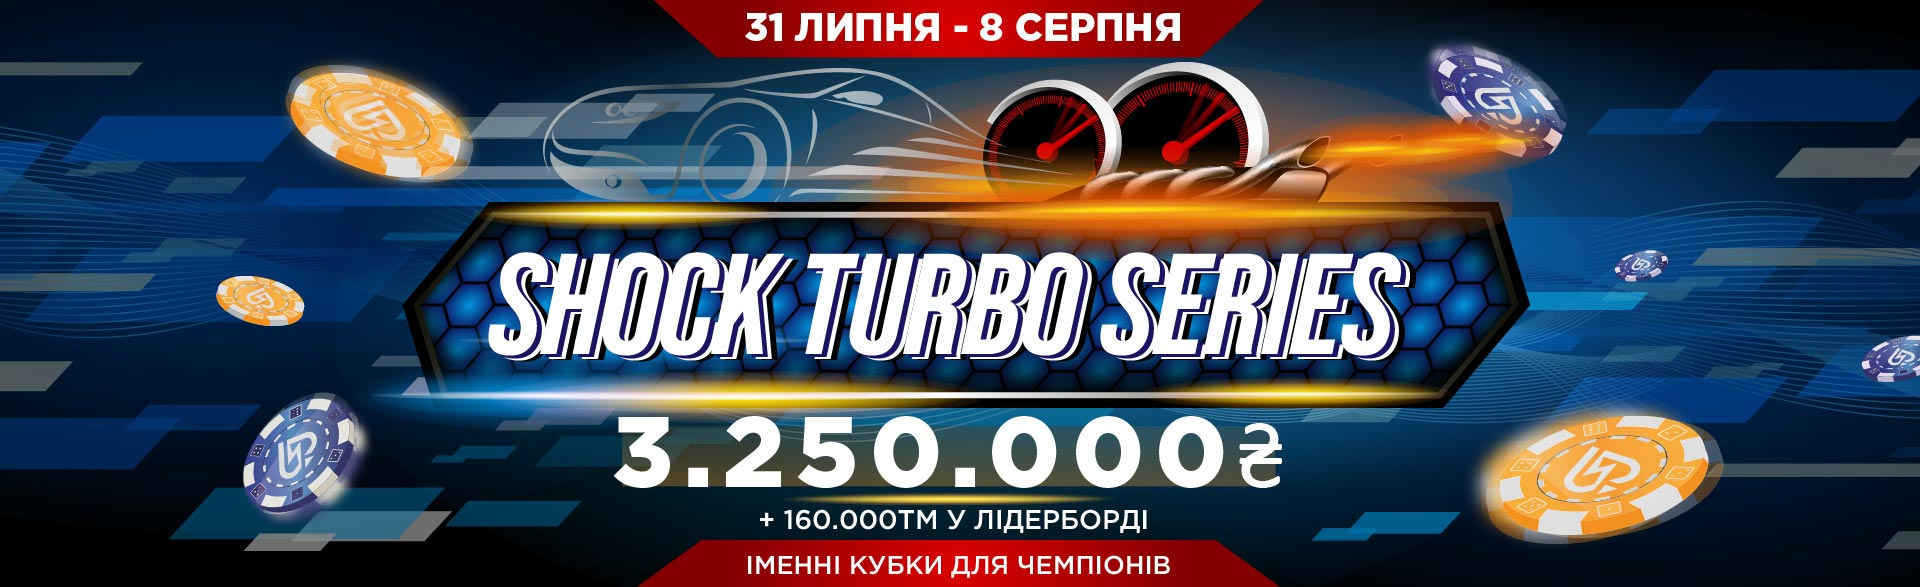 Shock Turbo Series